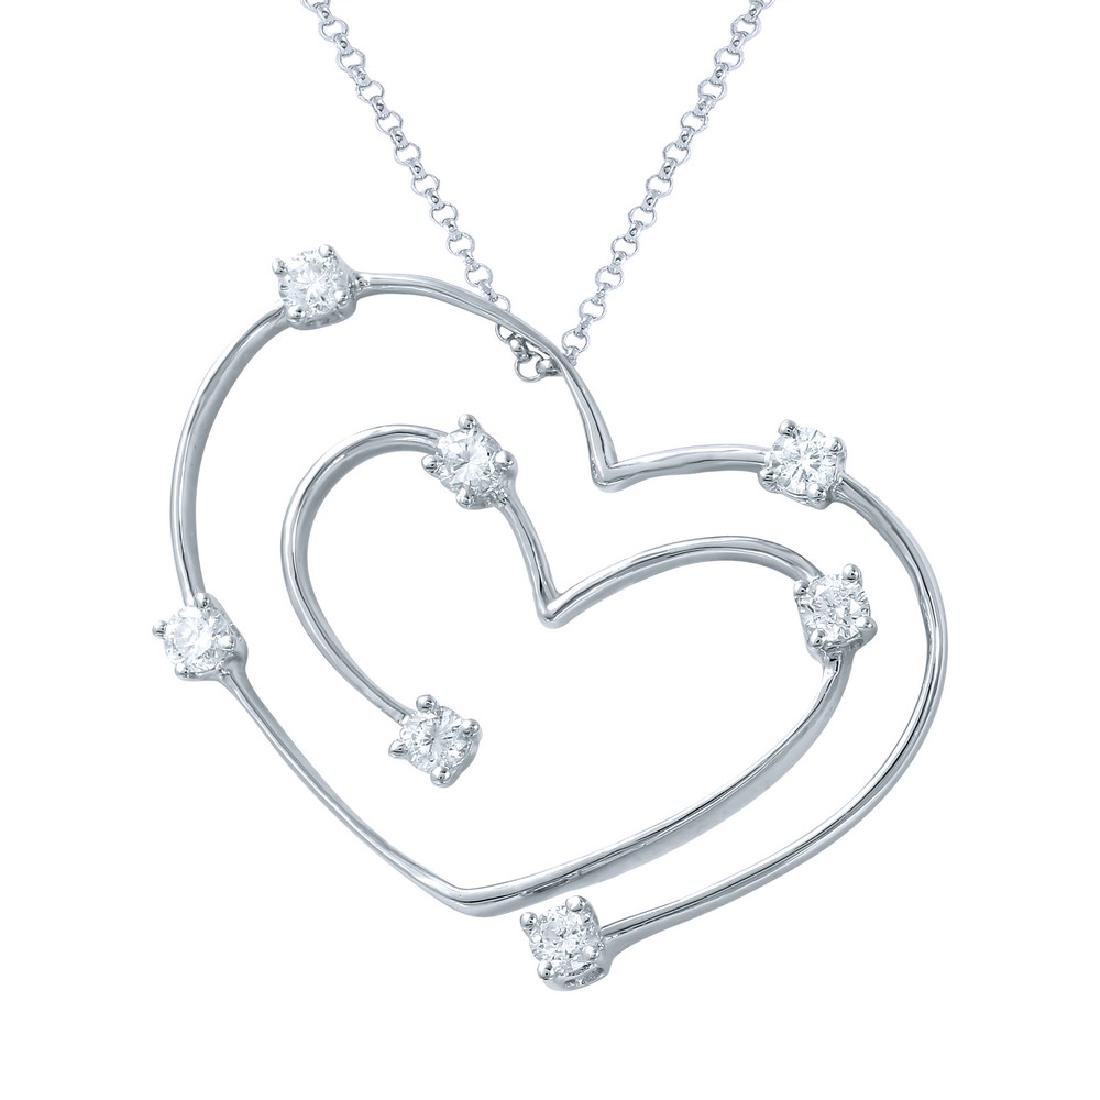 Genuine 0.37 TCW 18K White Gold Ladies Necklace